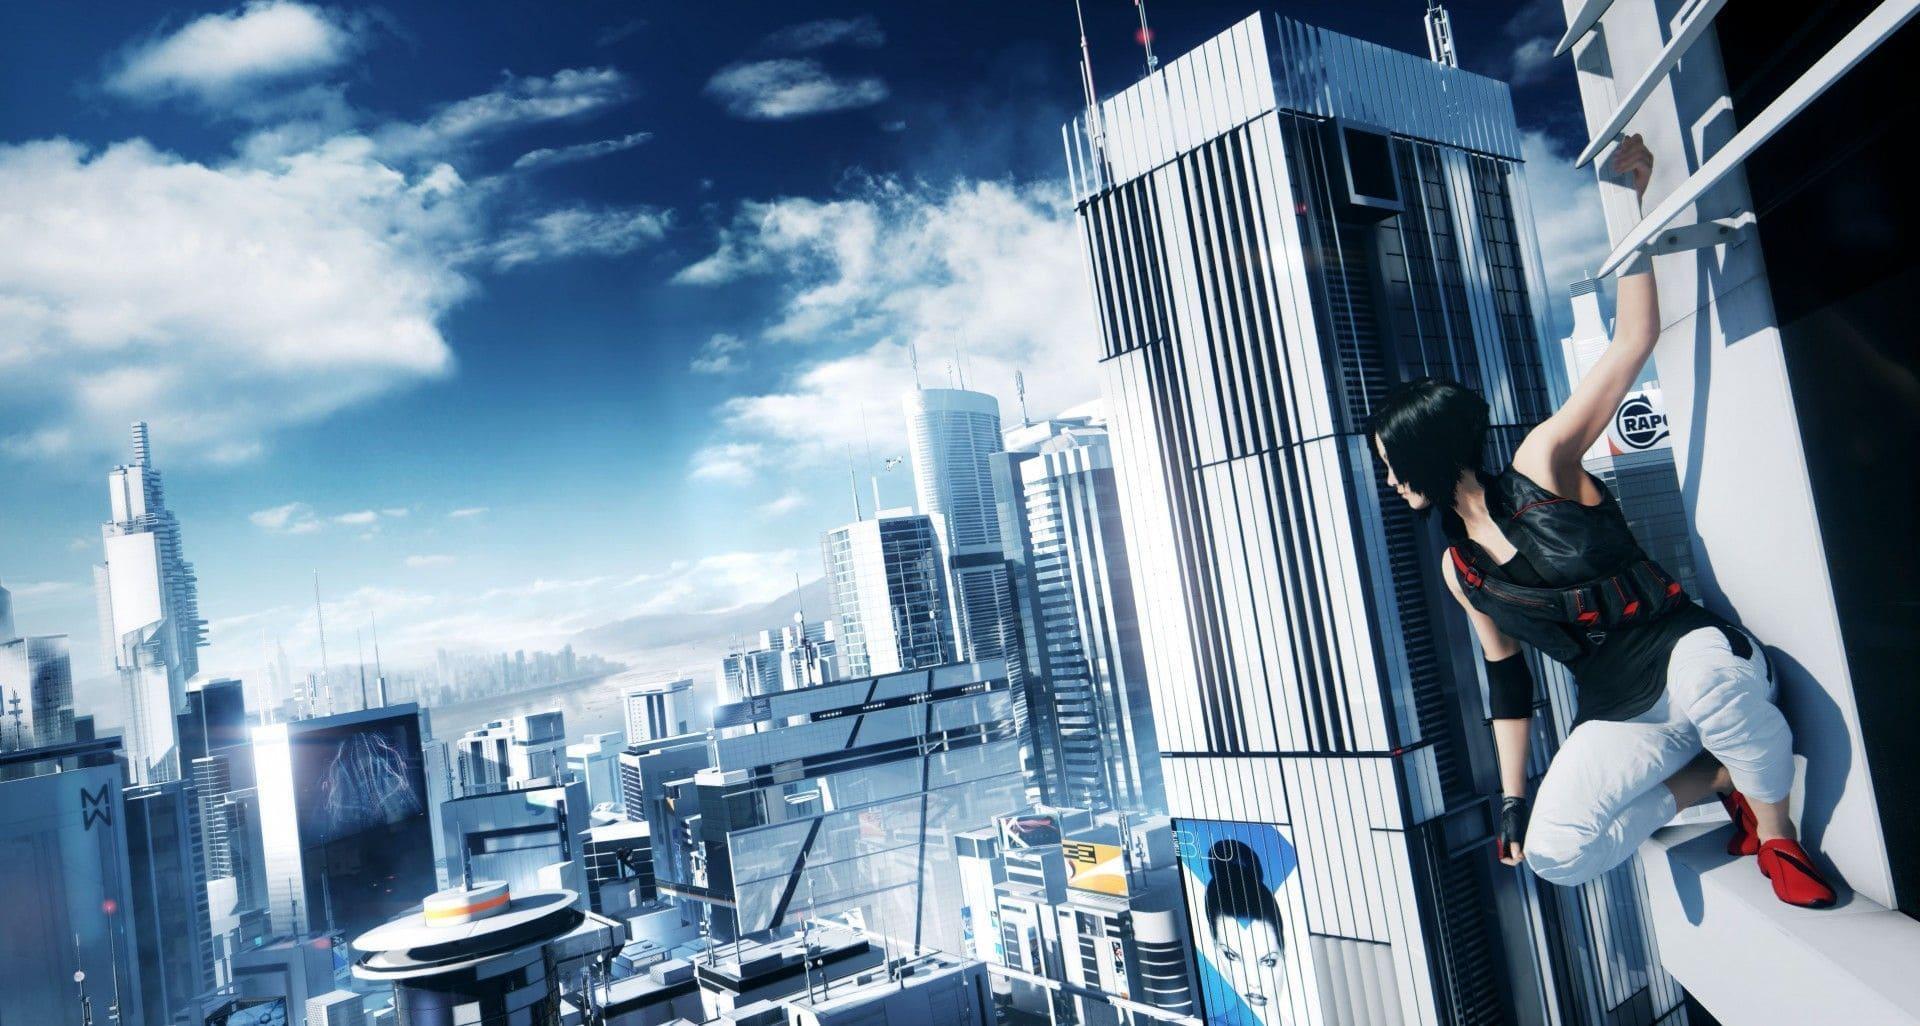 Обзор игры Mirror's Edge Catalyst